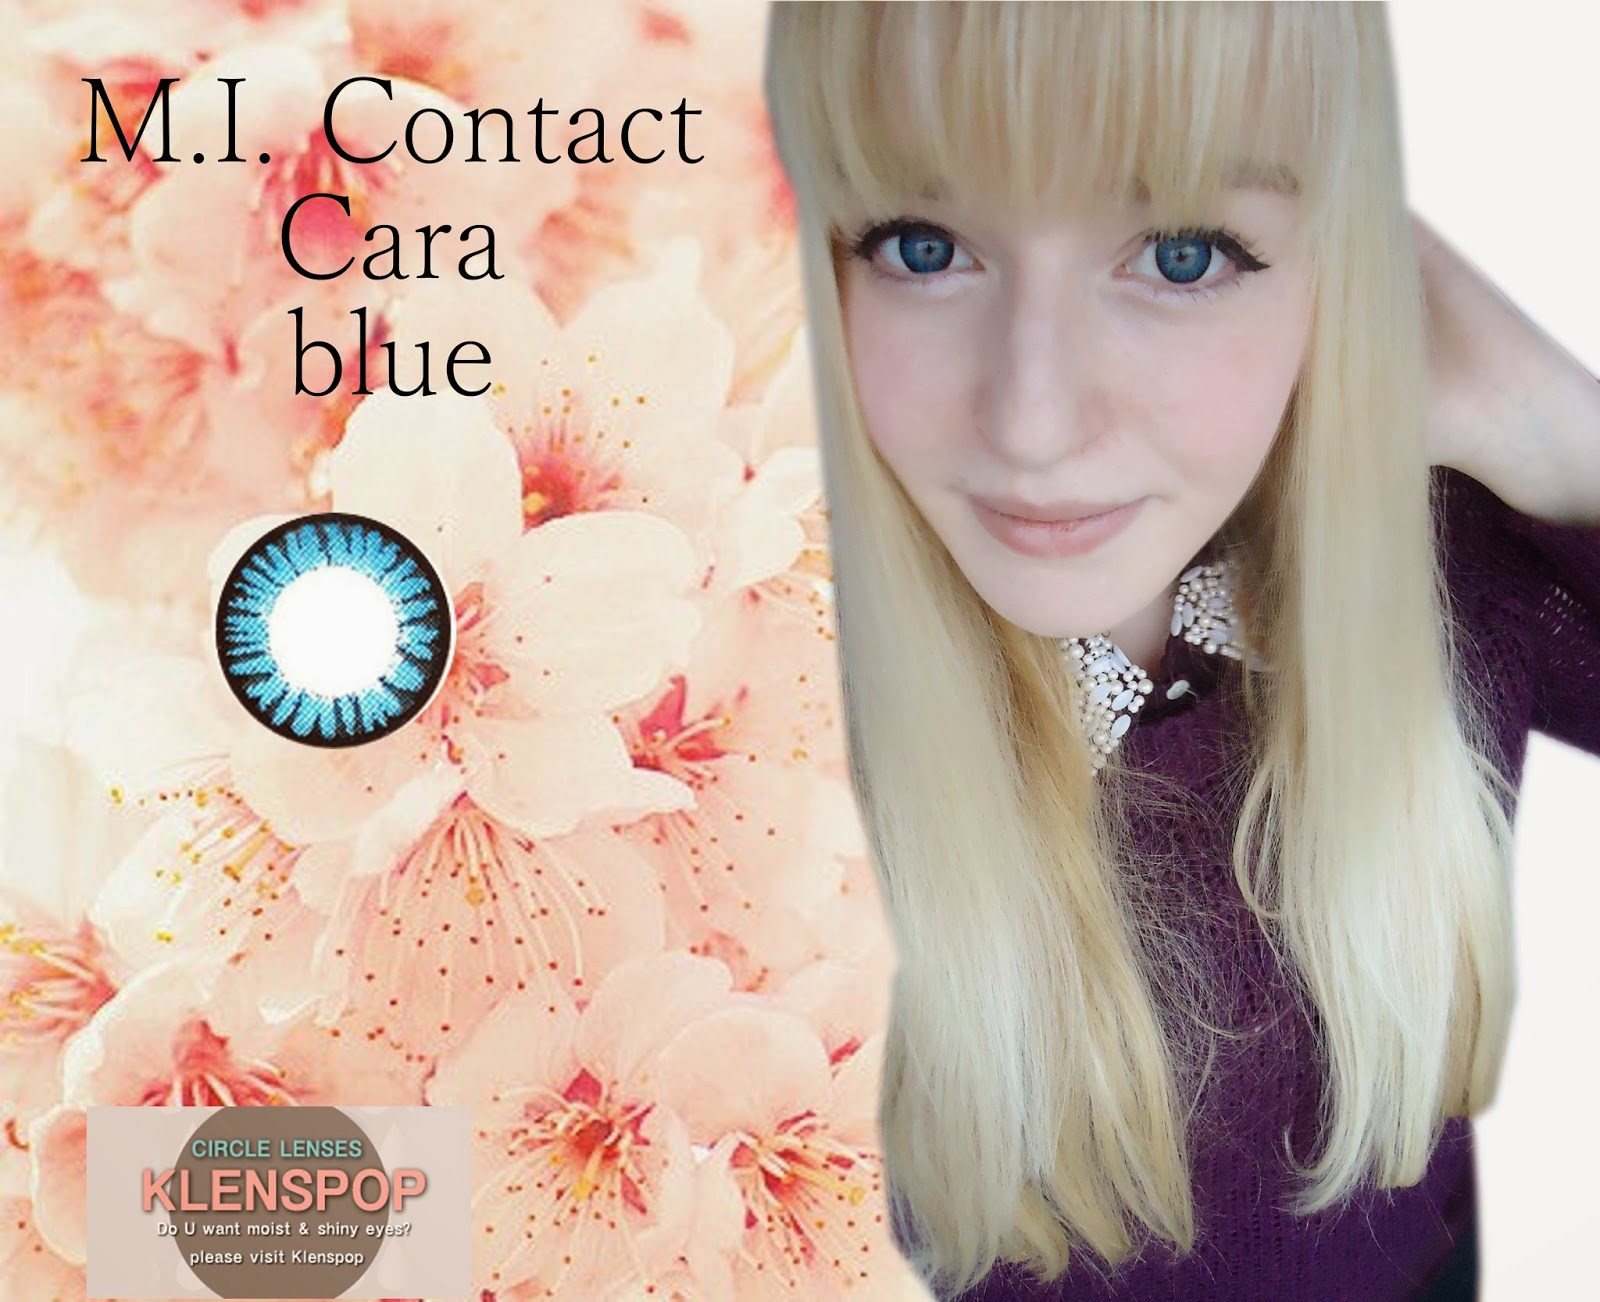 http://klenspop.com/en/home/375-cara-blue.html?search_query=cara&results=7